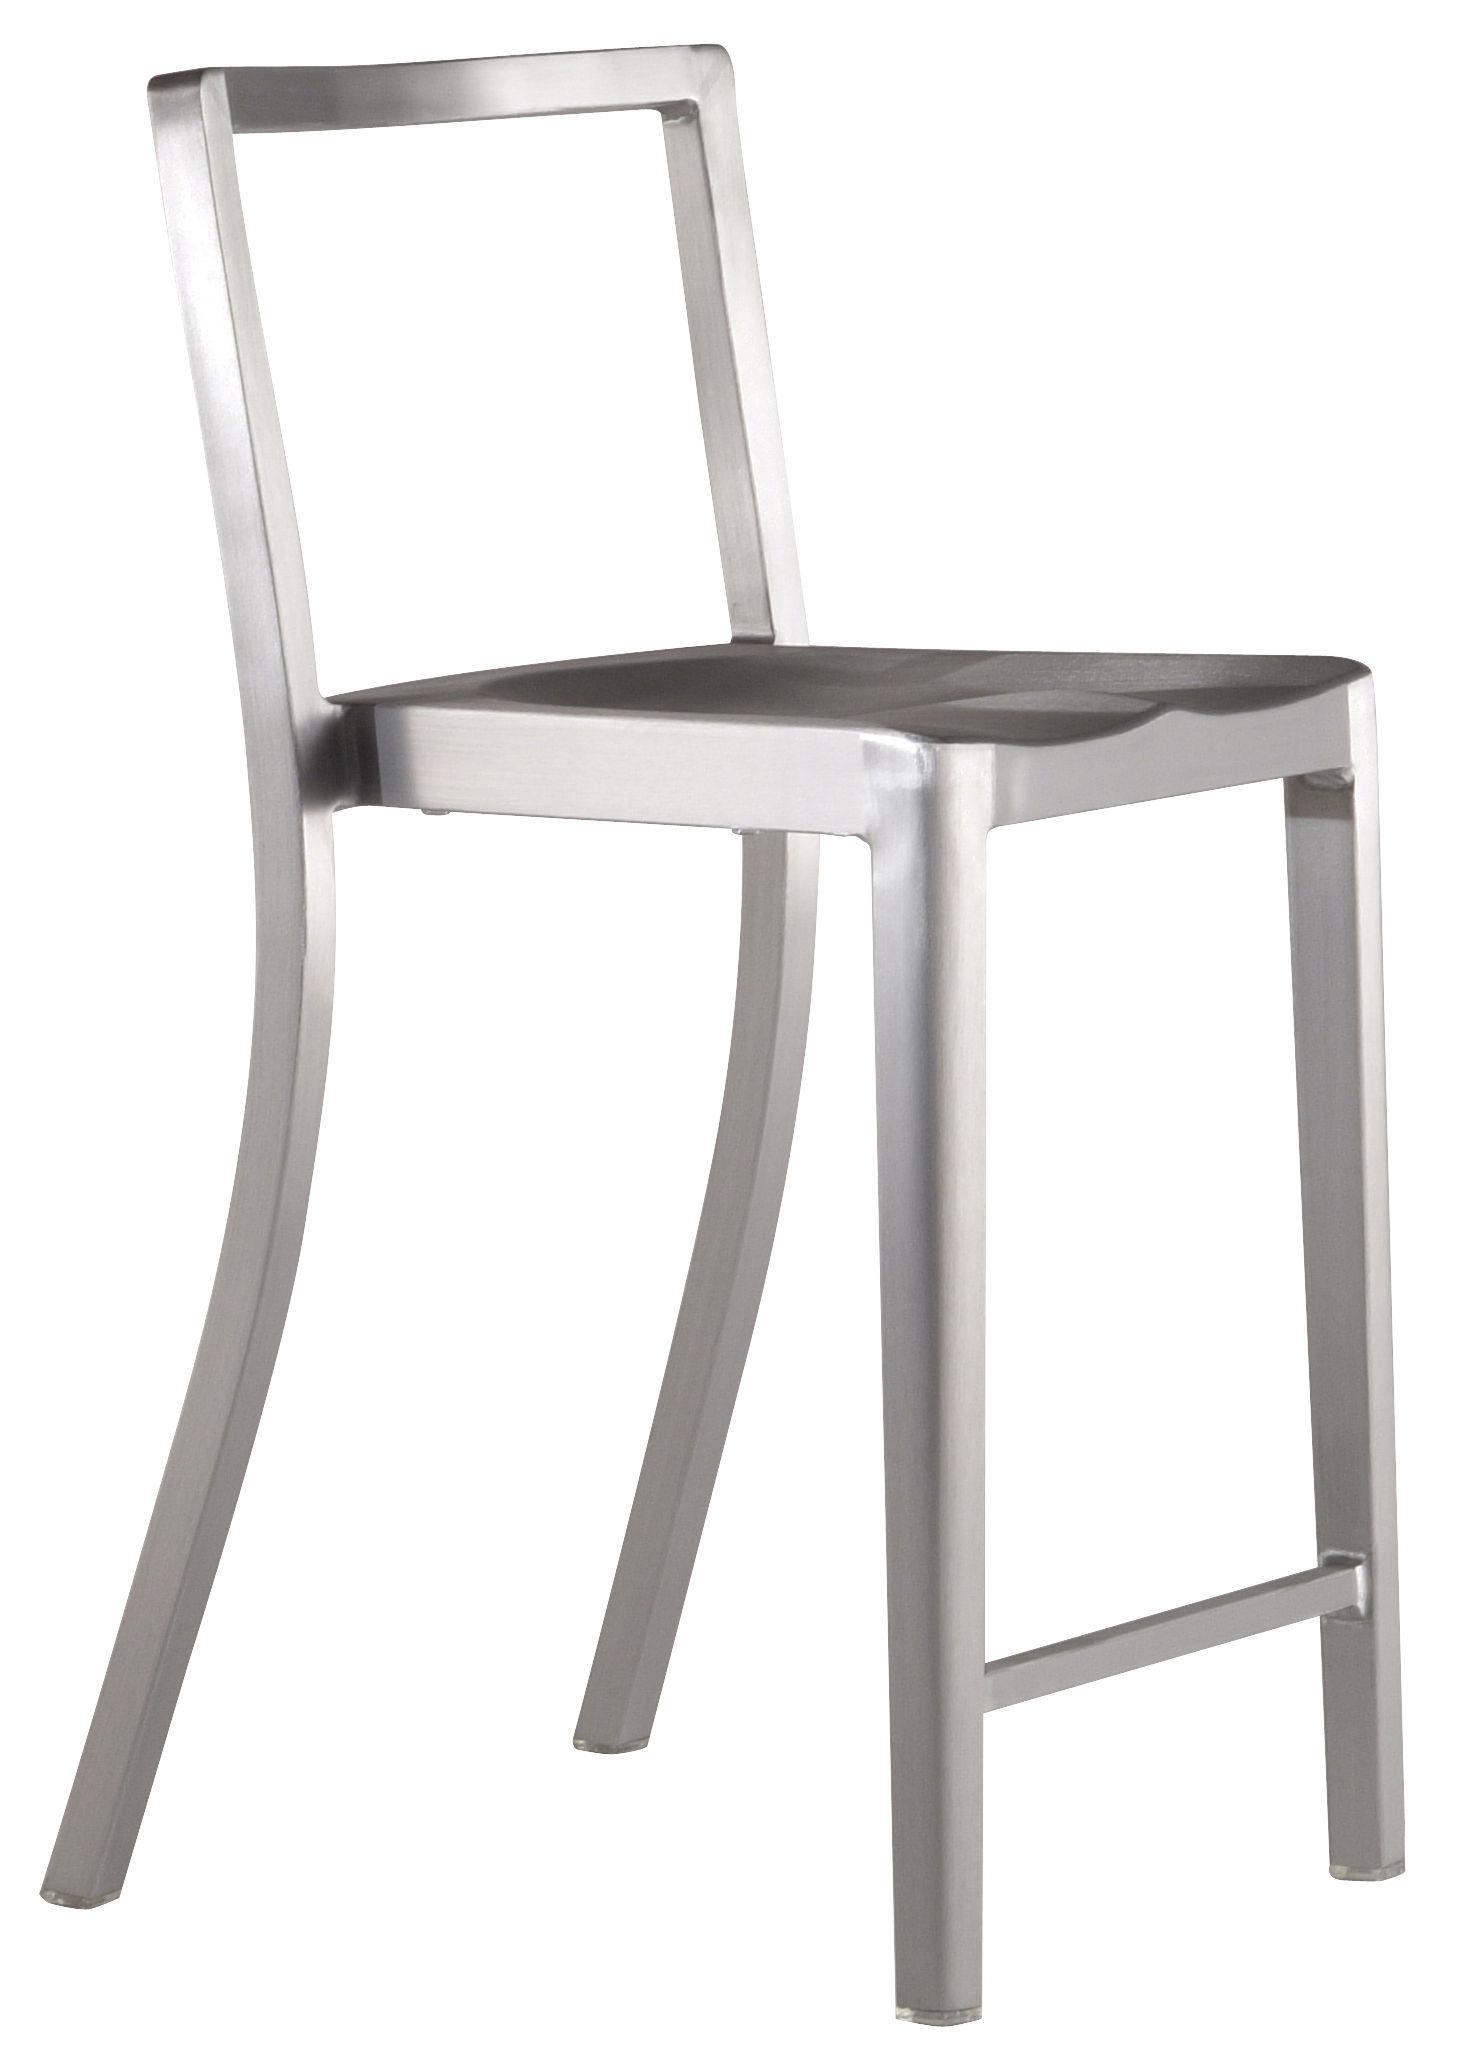 Mobilier - Tabourets de bar - Chaise de bar Icon Outdoor / H 61 cm - Aluminium brossé - Emeco - Aluminium brossé (outdoor) - Aluminium brossé